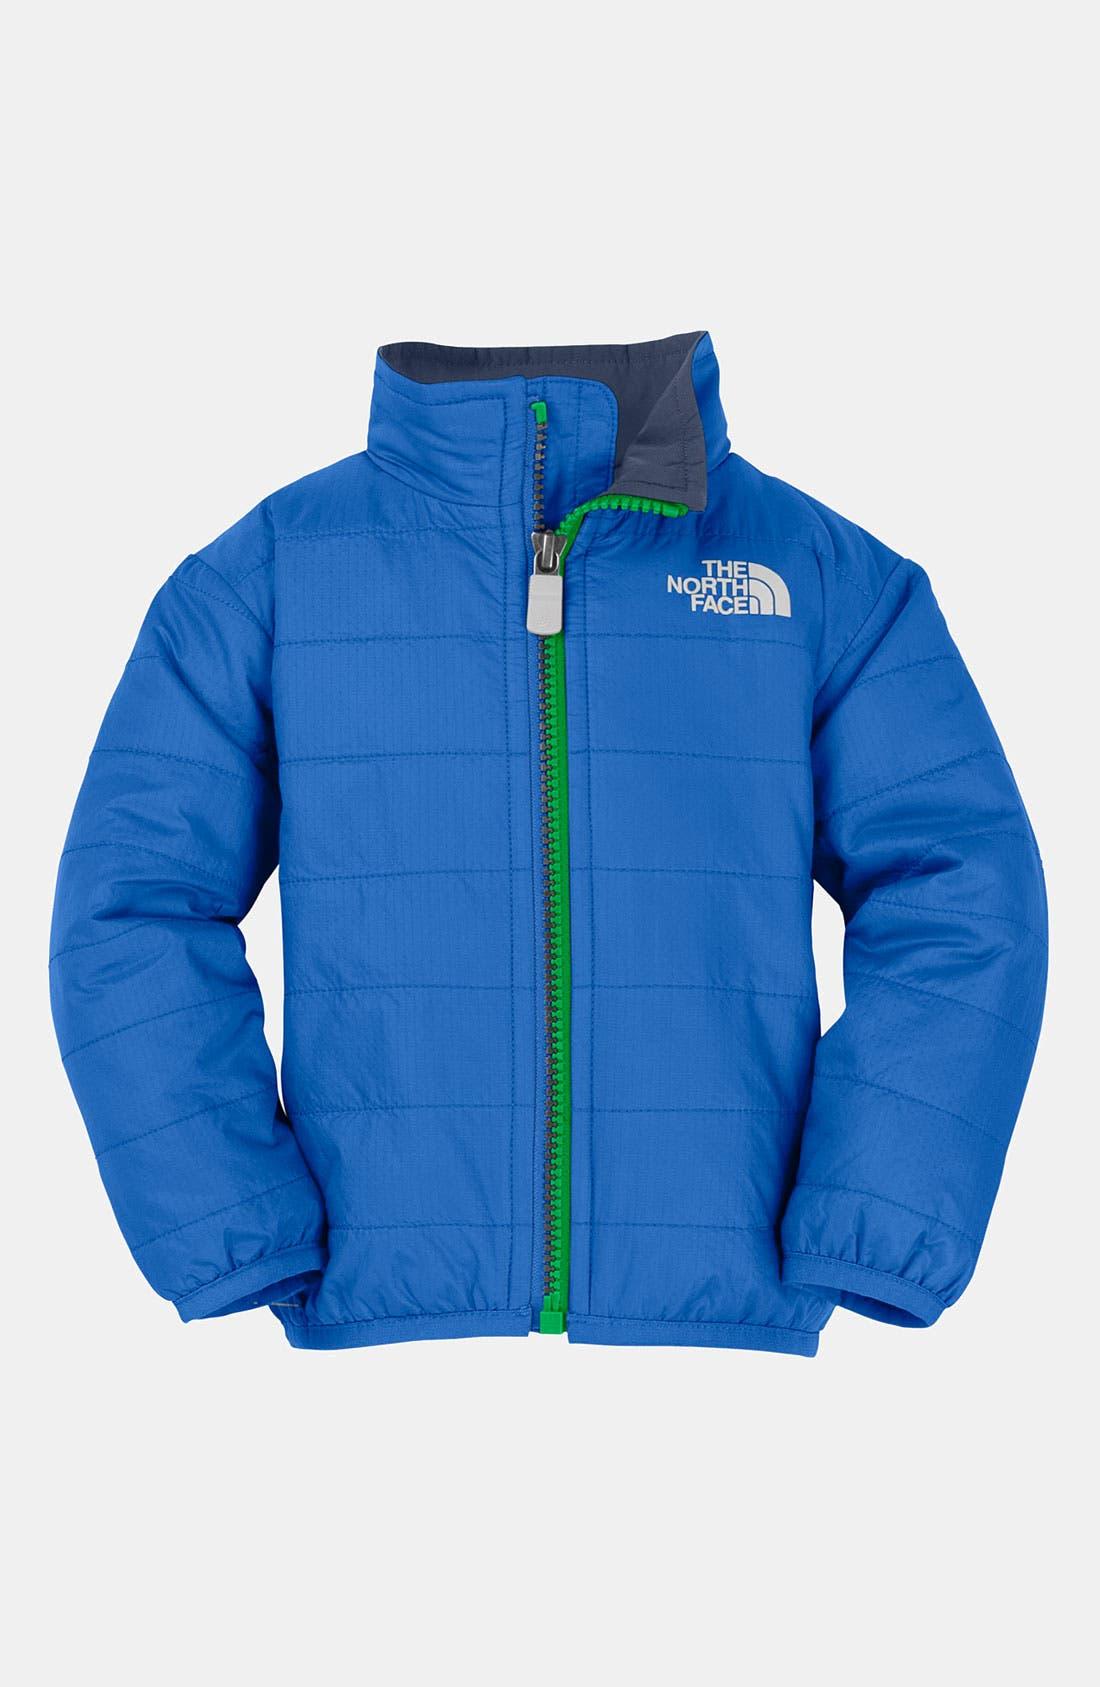 Main Image - The North Face 'Blaze' Jacket (Baby)